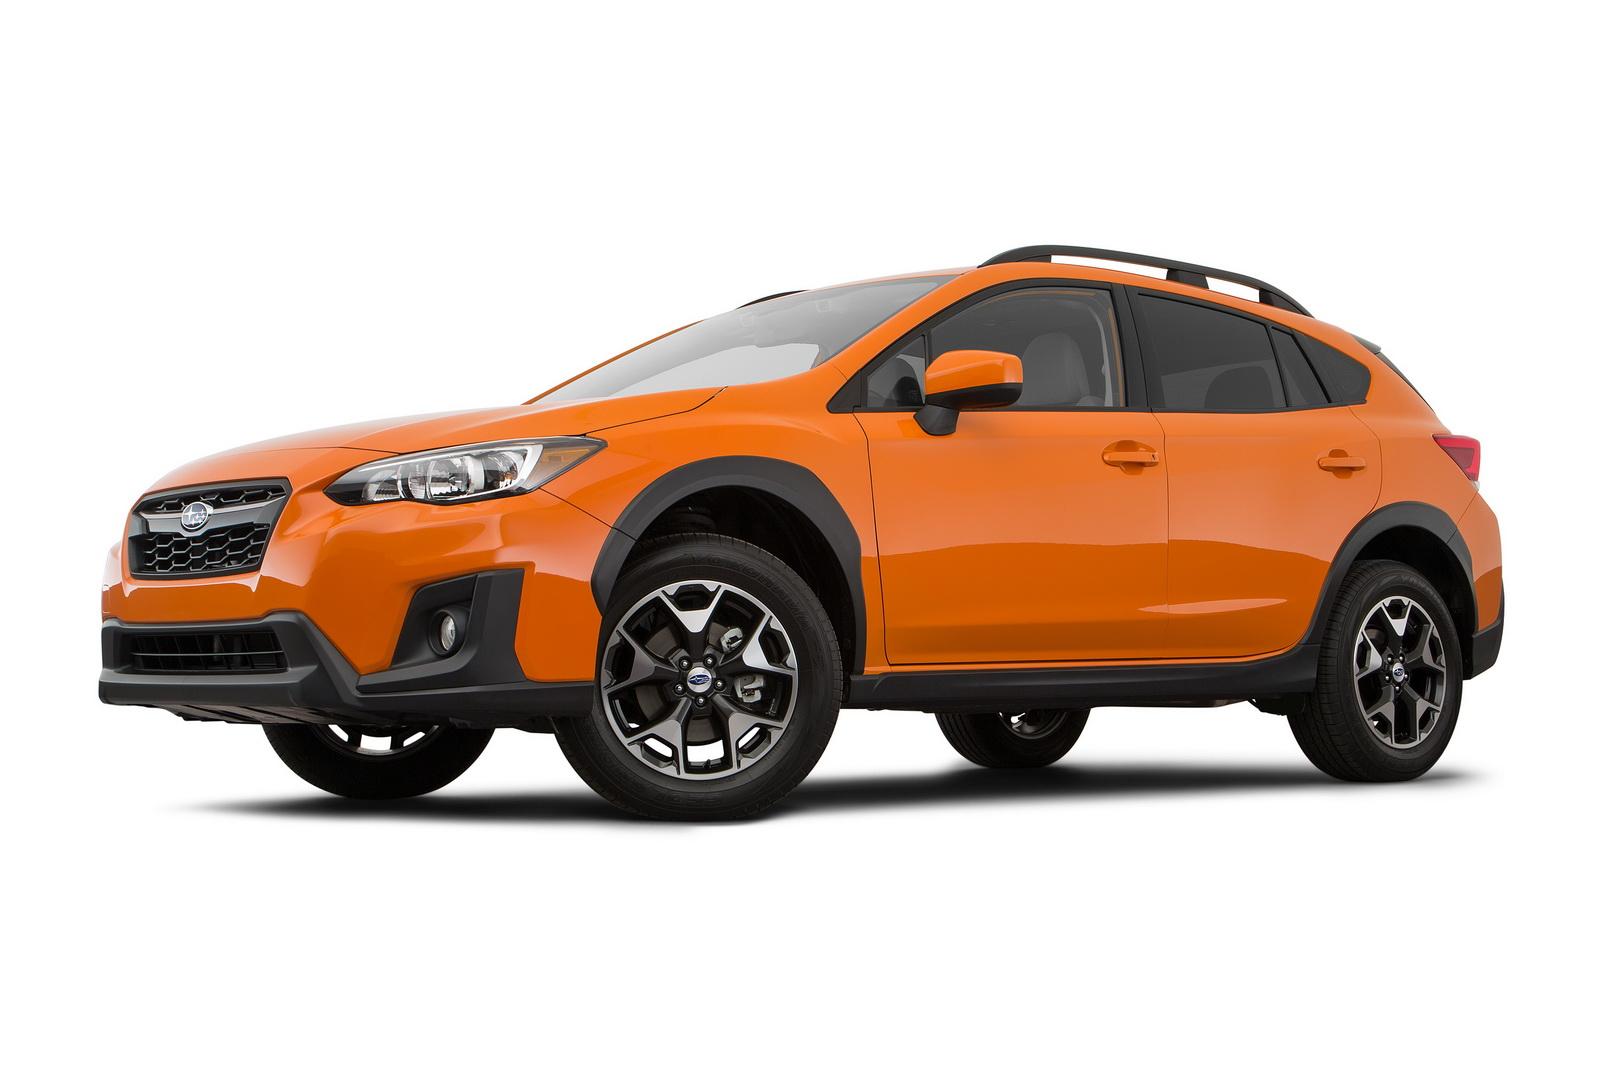 Subaru Prices All-New 2018 Crosstrek From $21,795 [30 Pics]